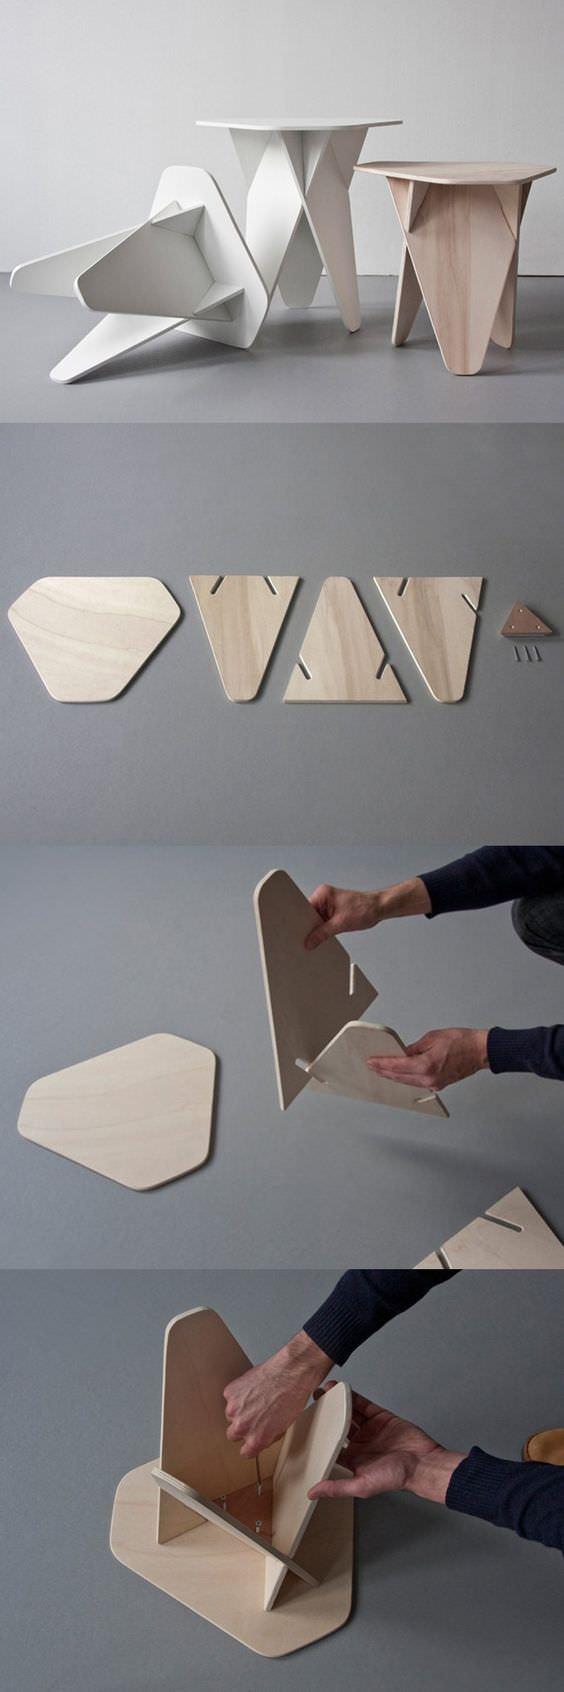 diy-furniture-decor